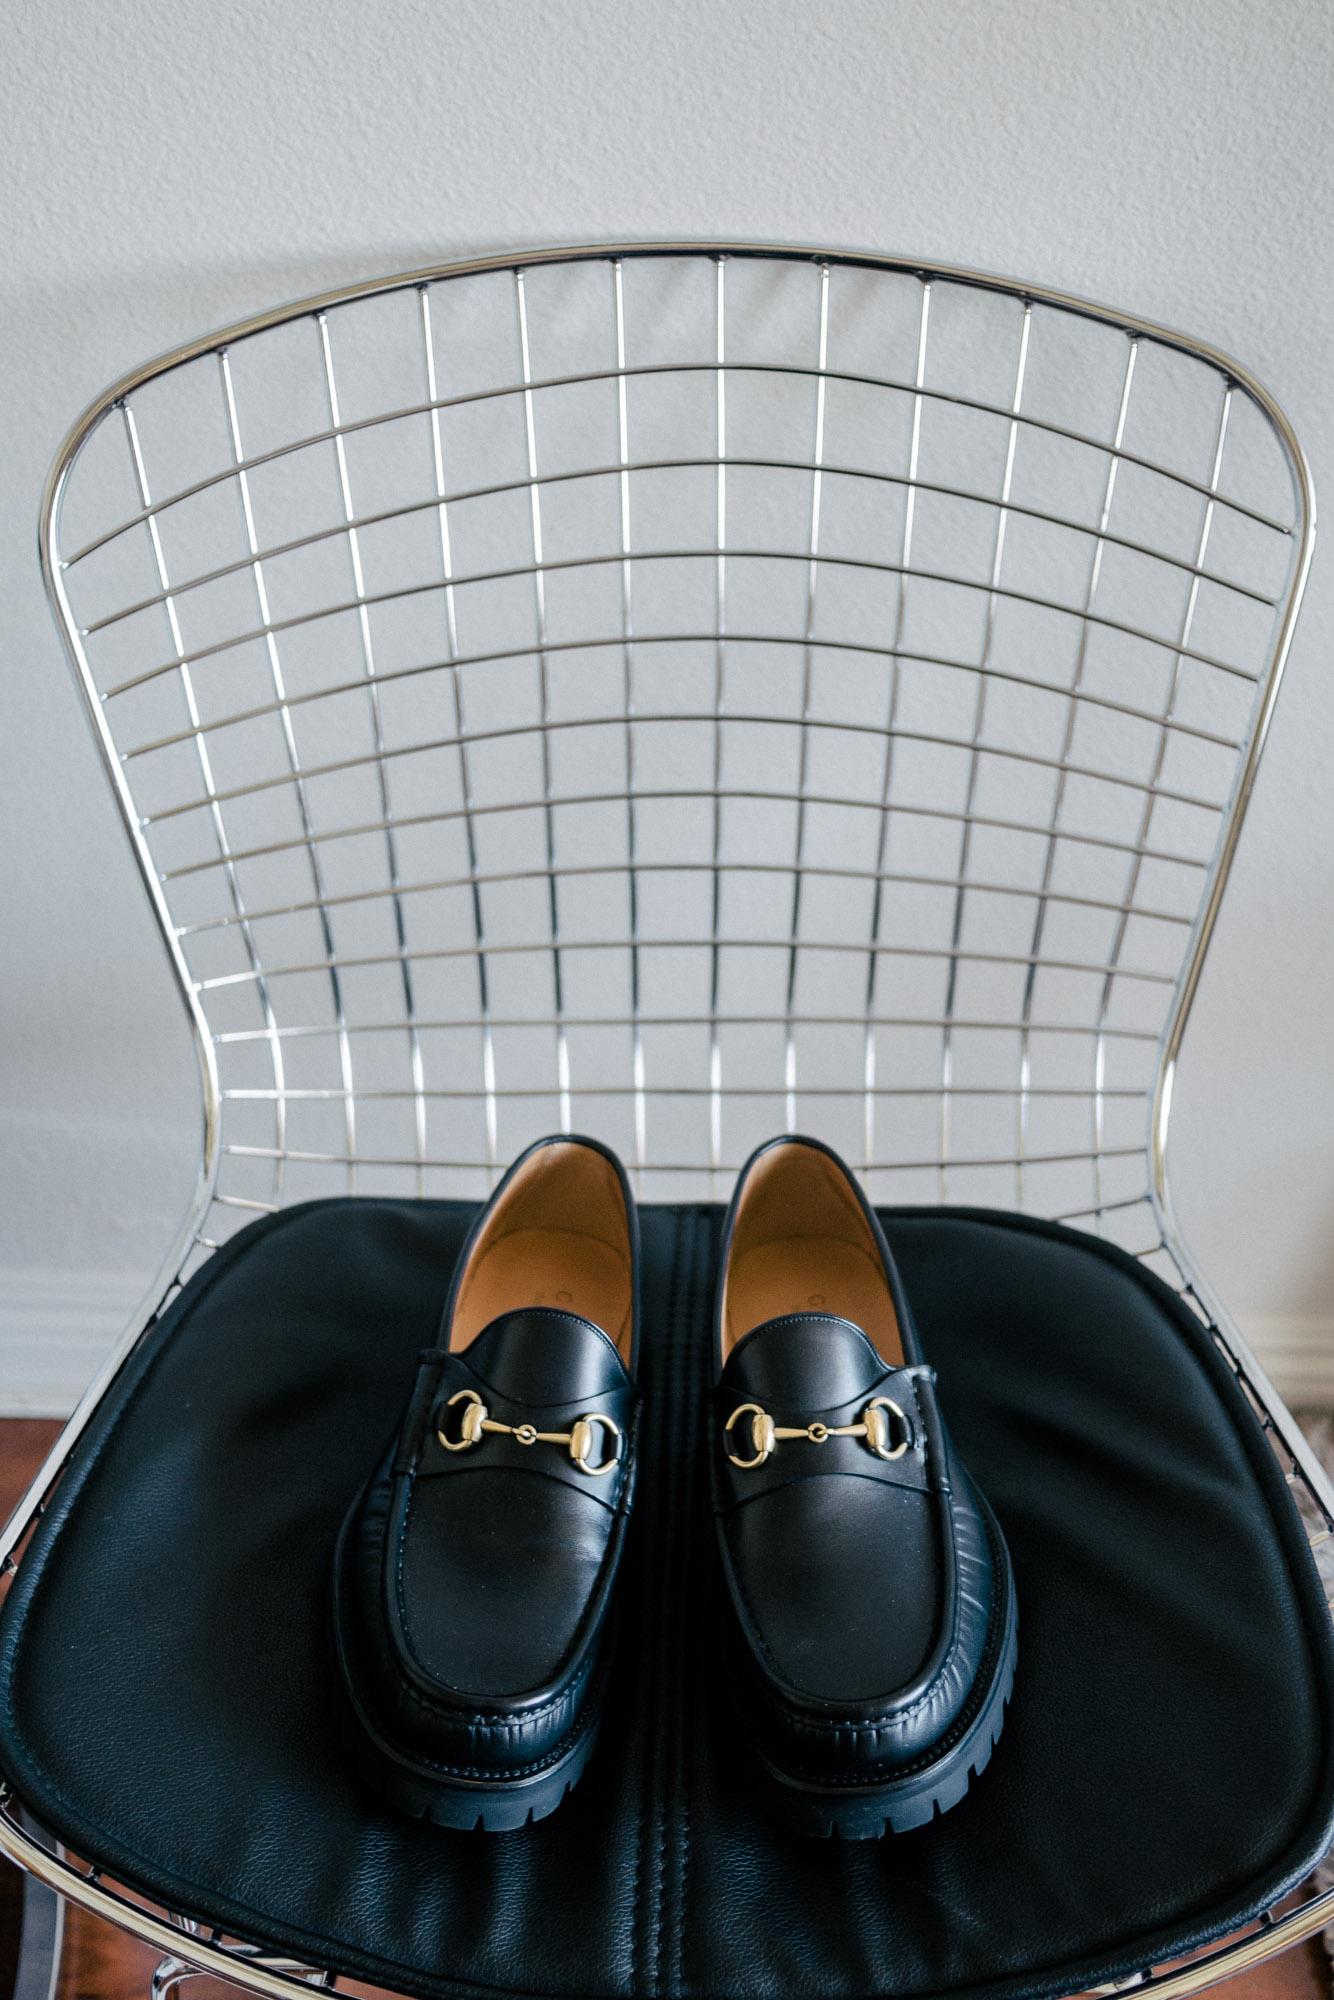 mybelonging-gucci-horsebit-black-loafers-menswear-mens-shoes-luxury-designer-5.jpg